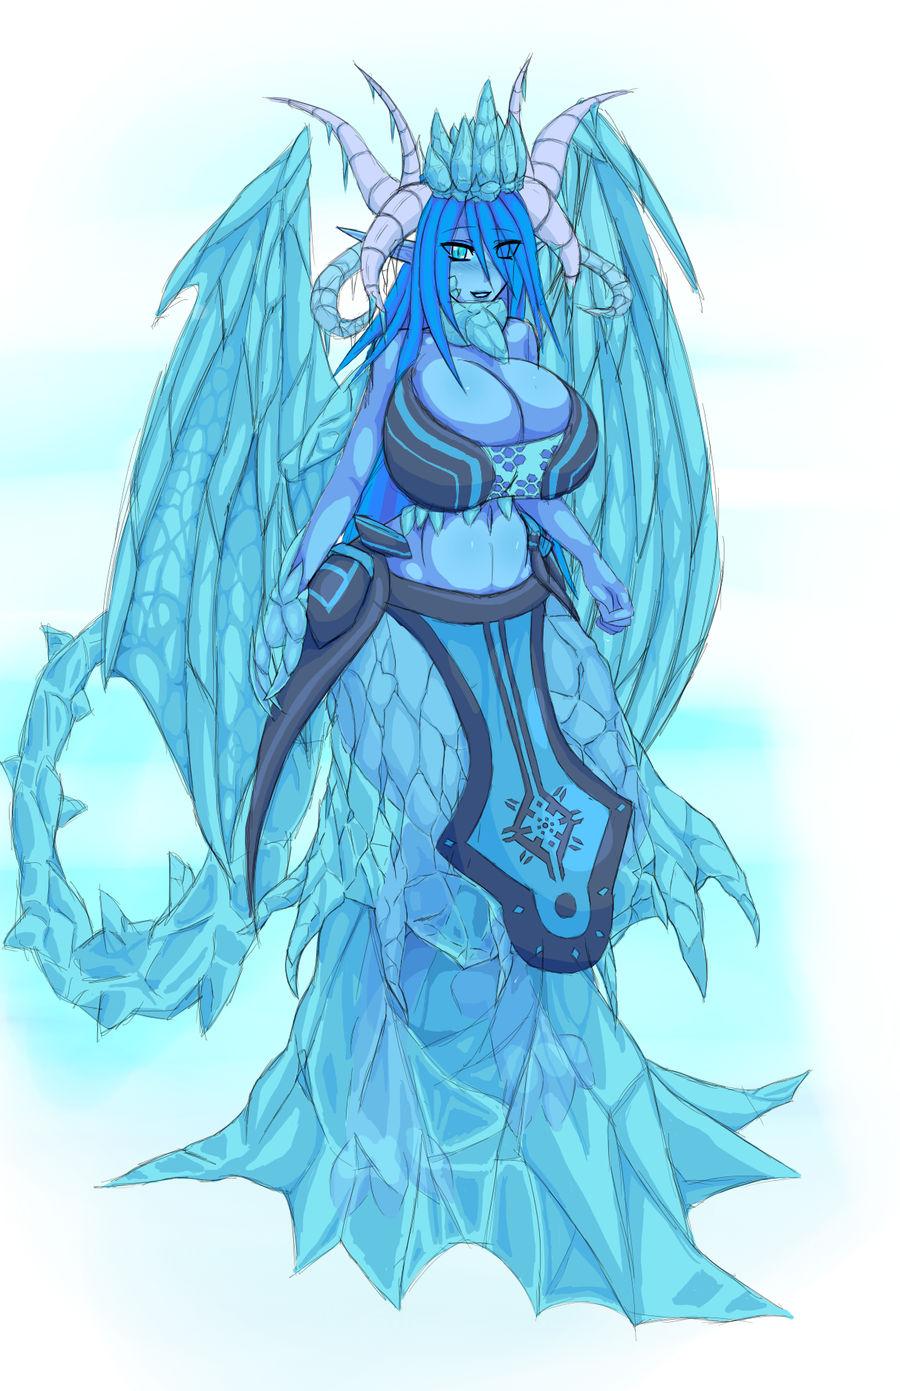 Minecraft Skin Ice Princess Wwwtollebildcom